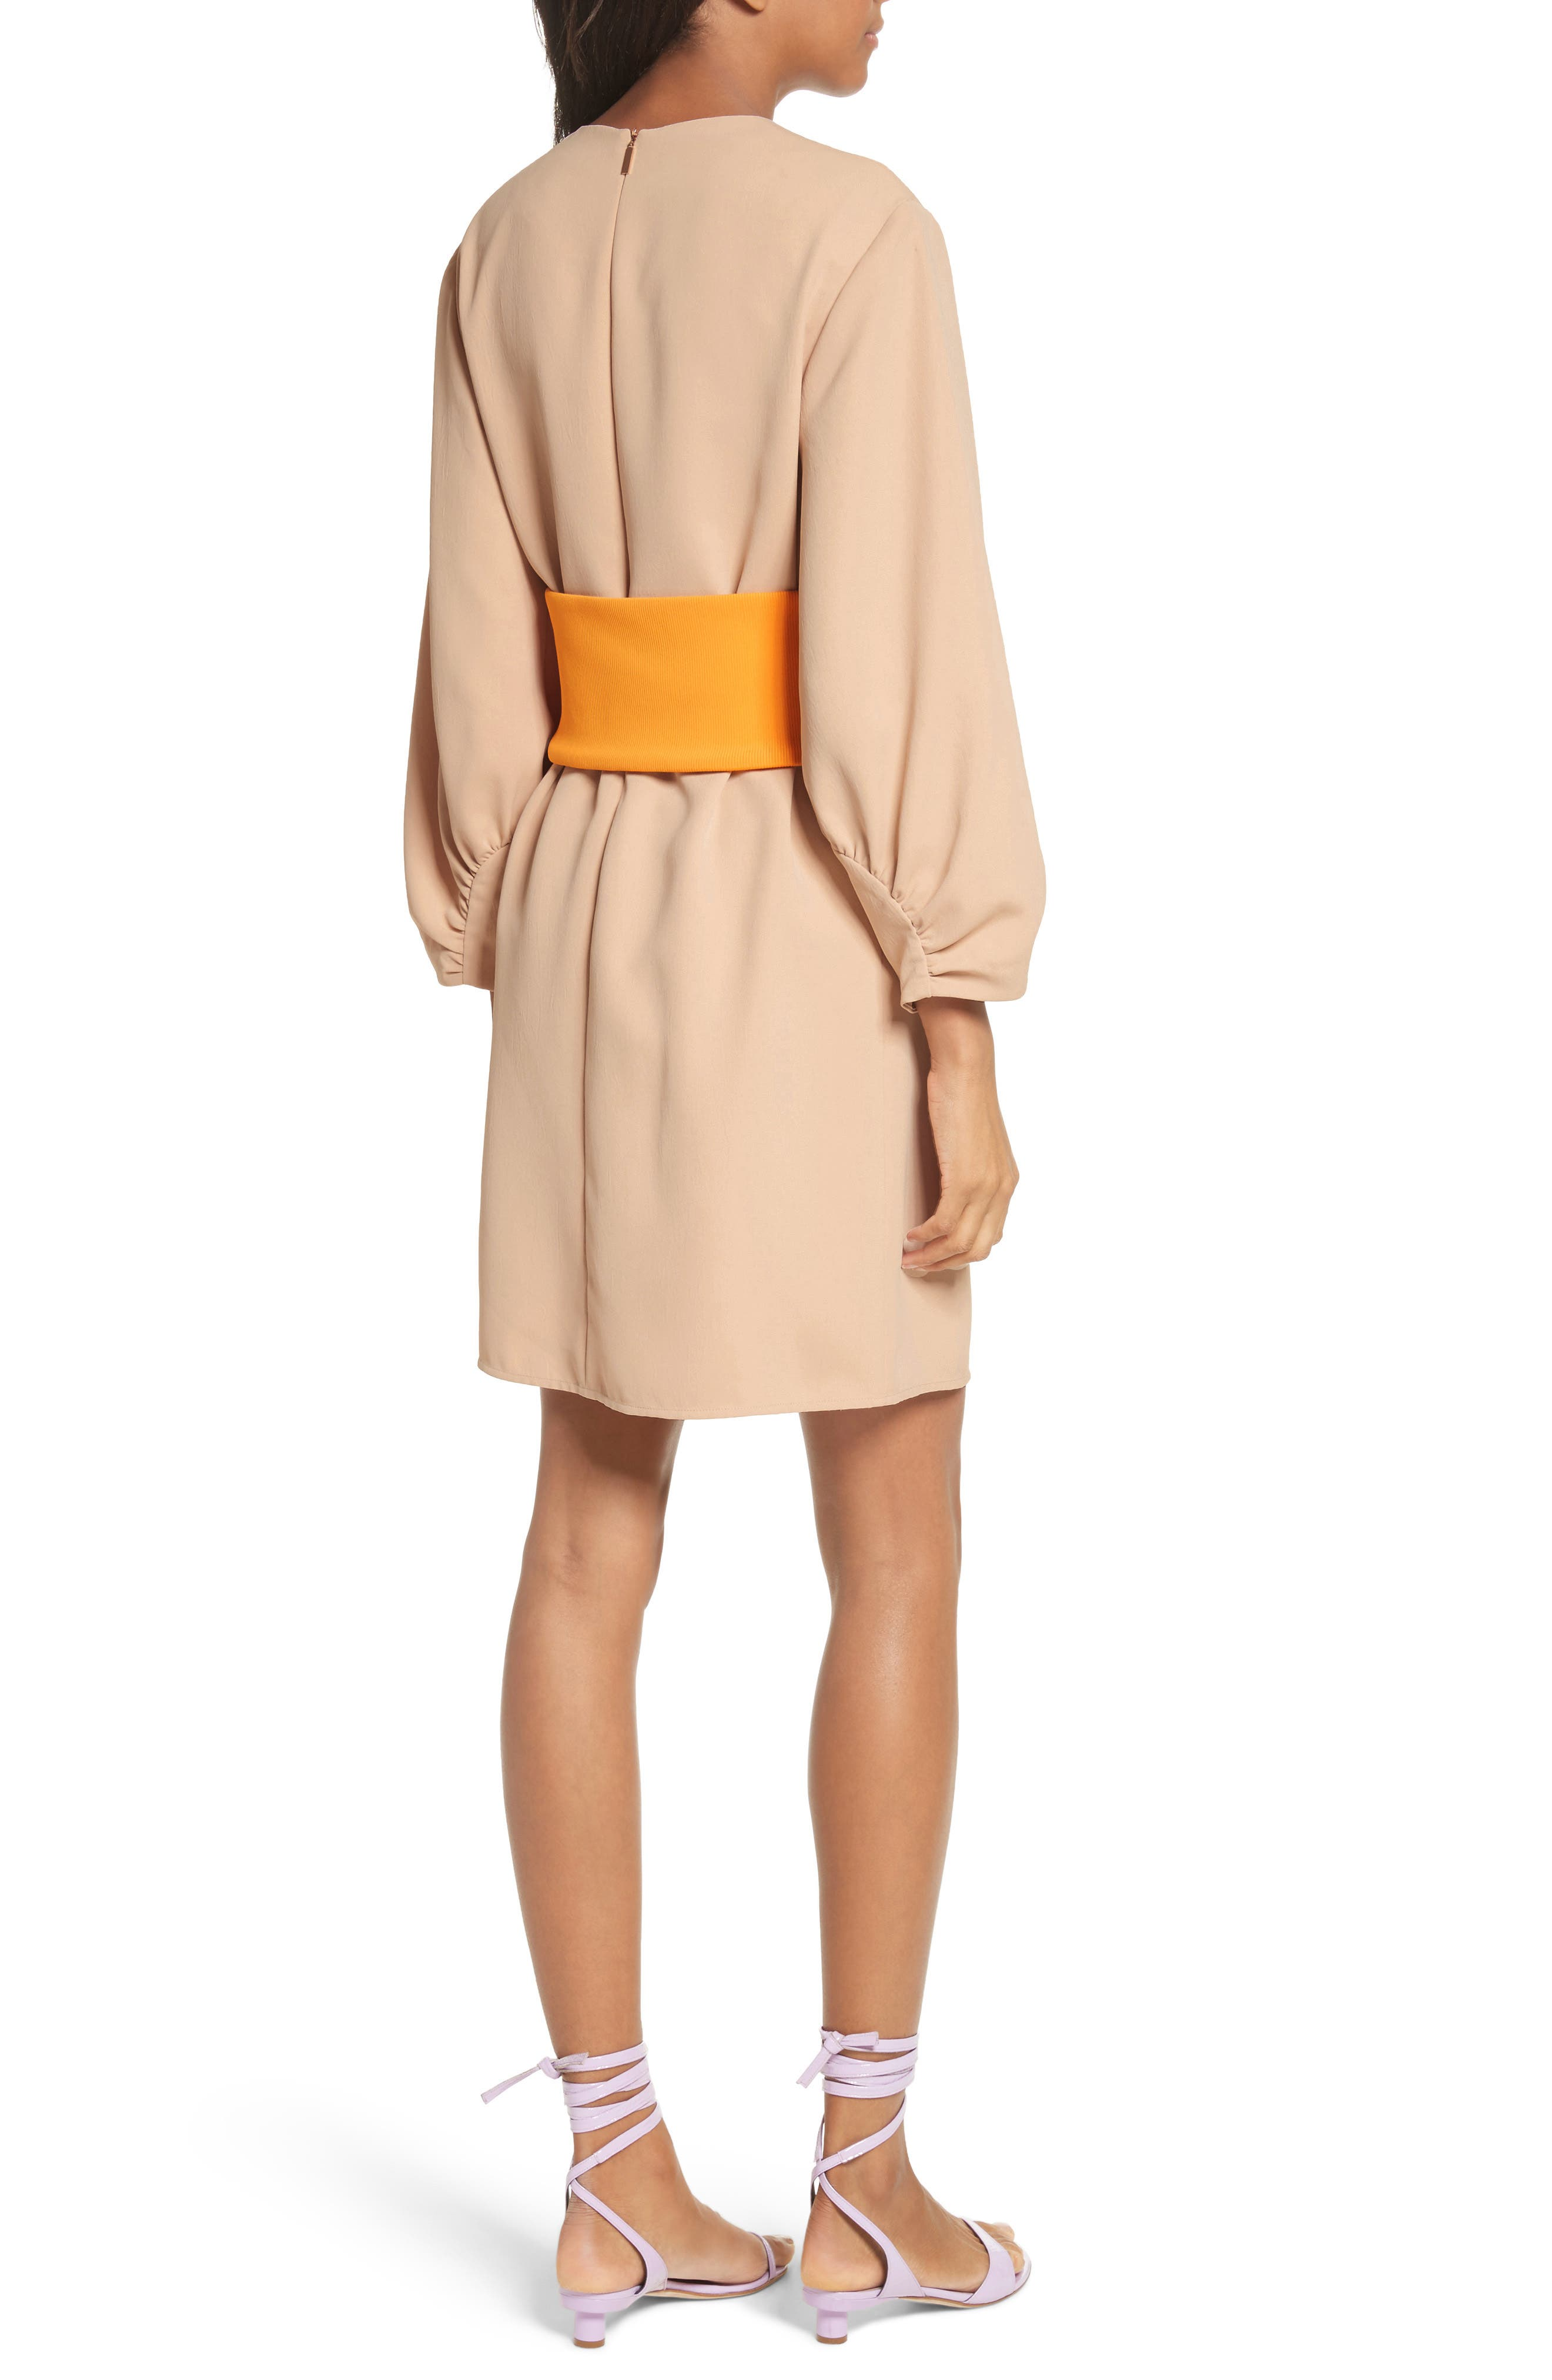 Shirred Sleeve Corset Dress,                             Alternate thumbnail 2, color,                             Nude/ Orange Multi